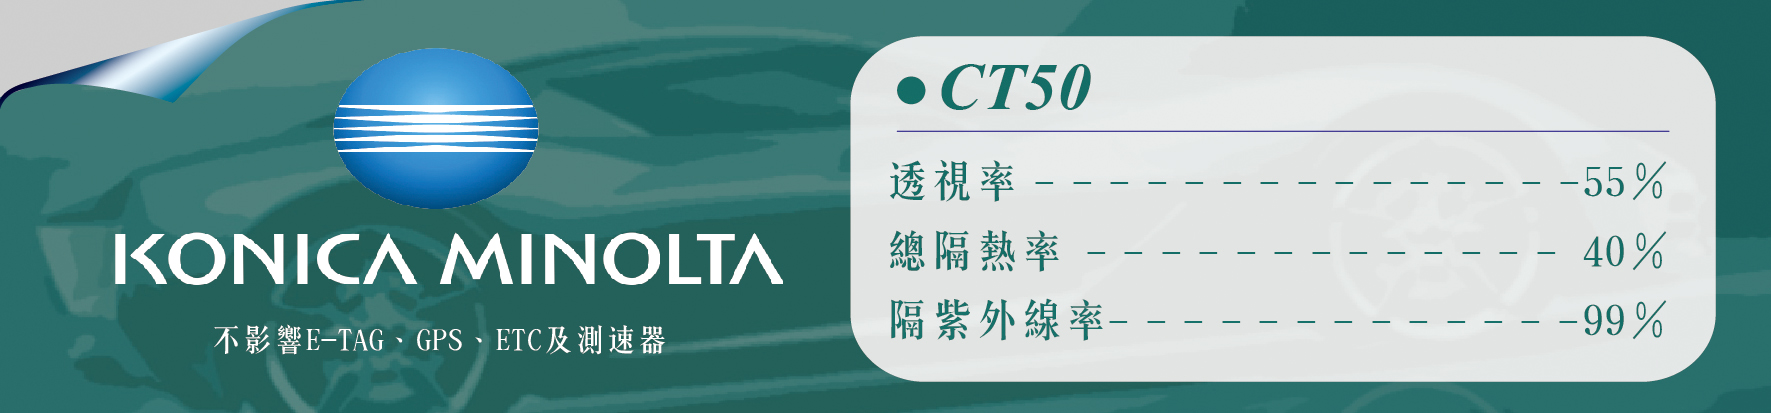 ct50隔熱紙